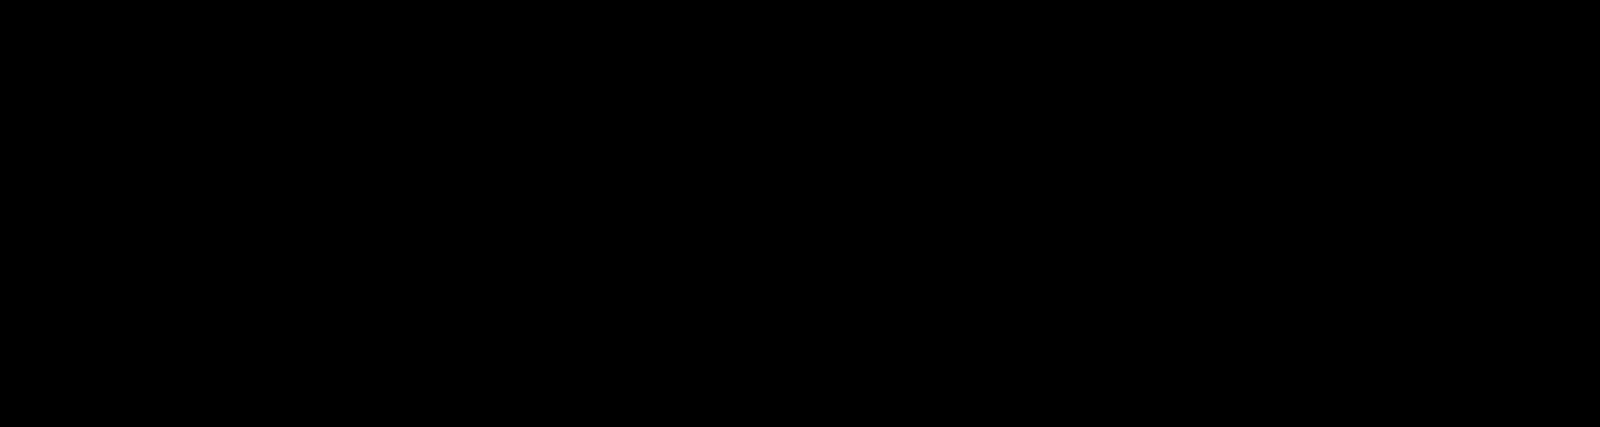 loreal-professional-logo.png